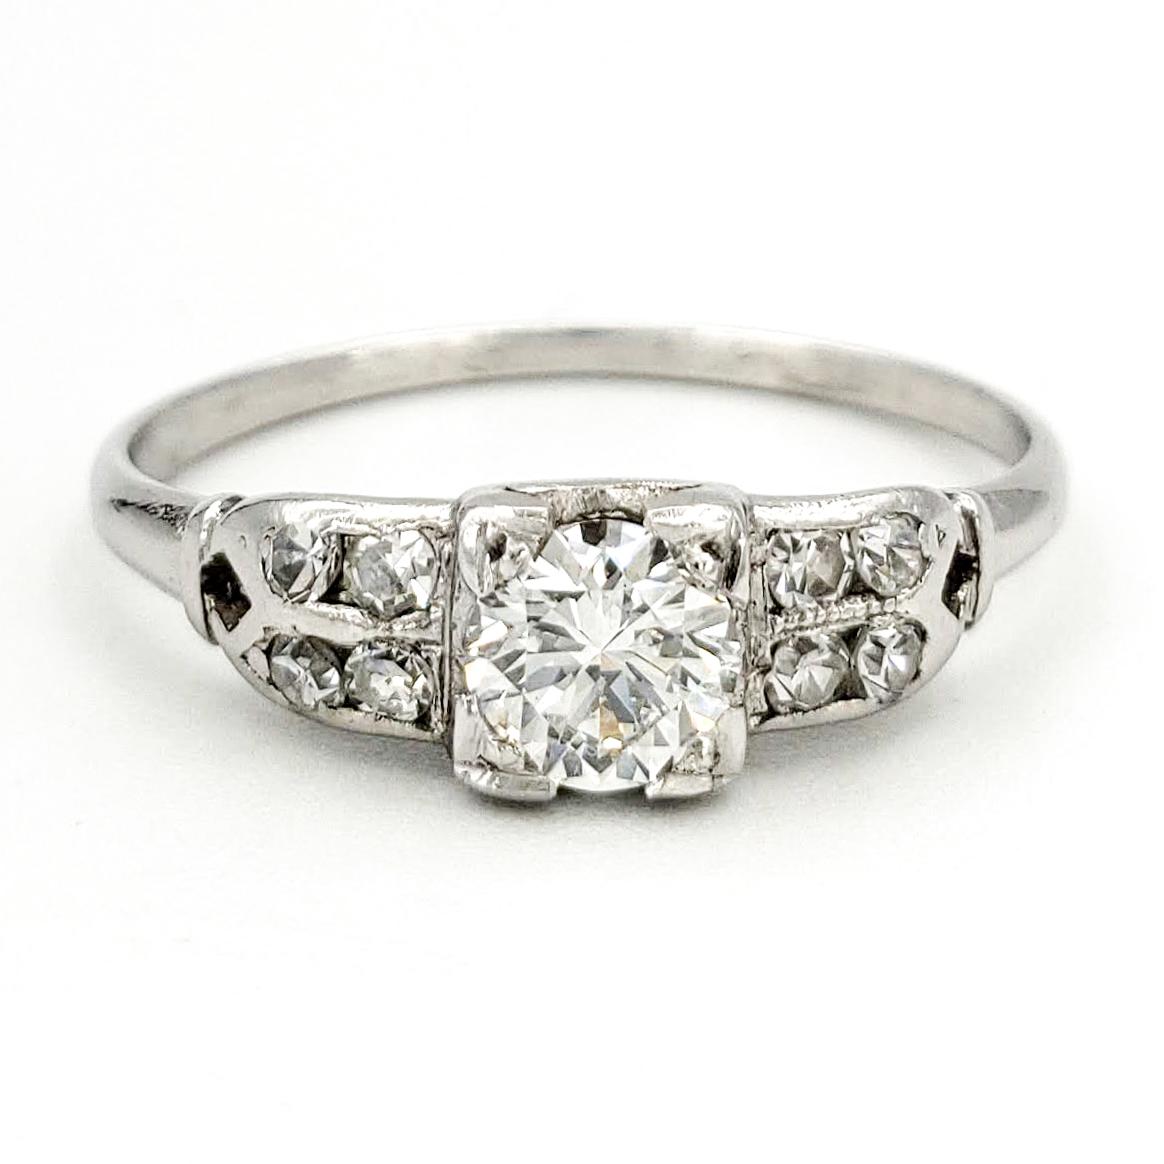 vintage-platinum-engagement-ring-with-0-37-carat-round-brilliant-cut-diamond-egl-e-vs2